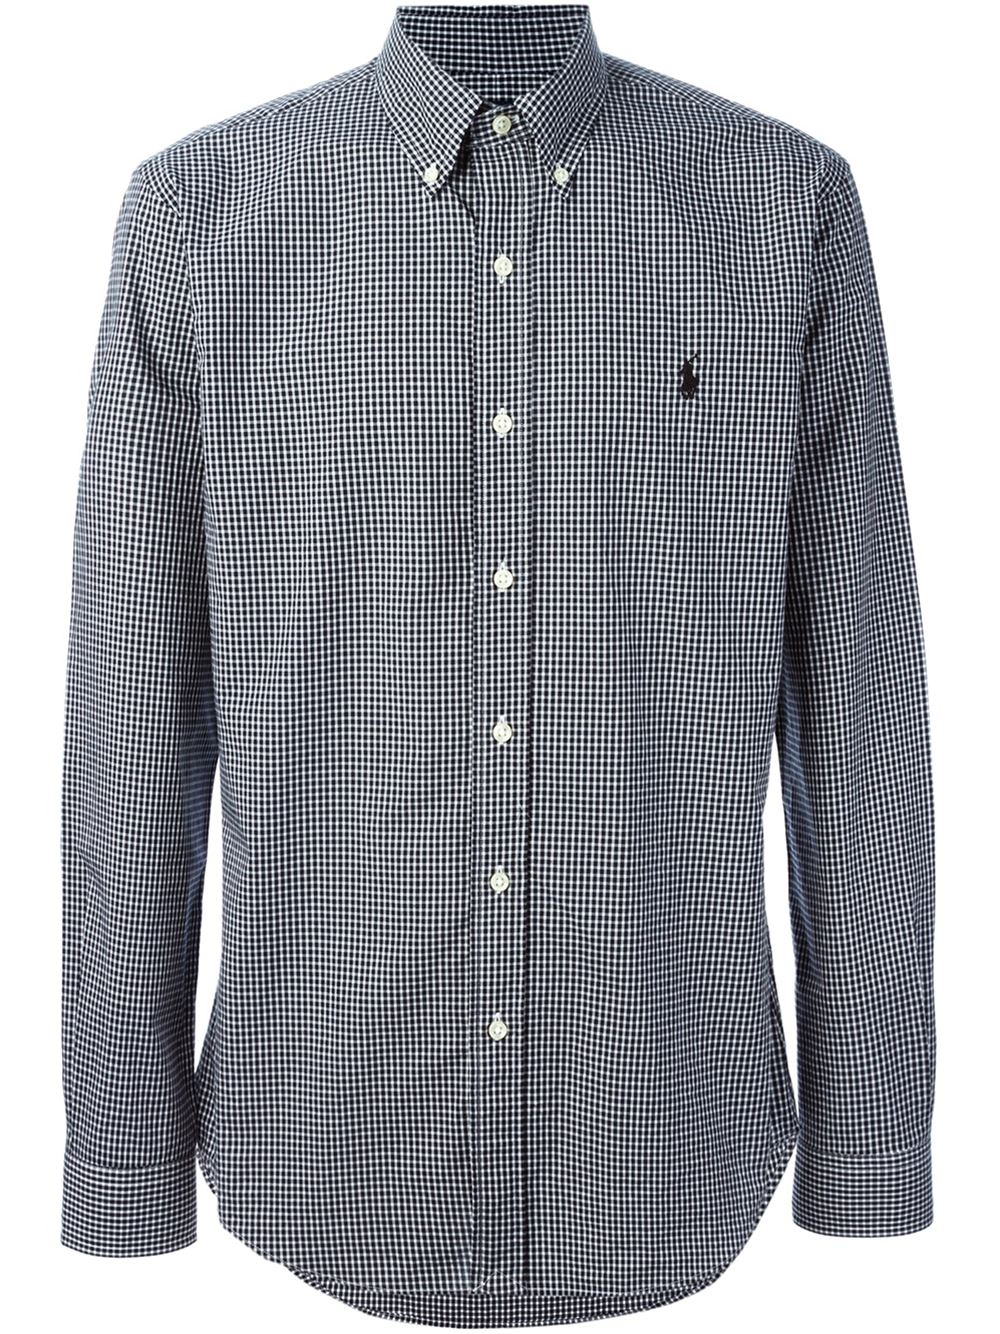 Polo ralph lauren Gingham Button Down Shirt in Black for Men | Lyst